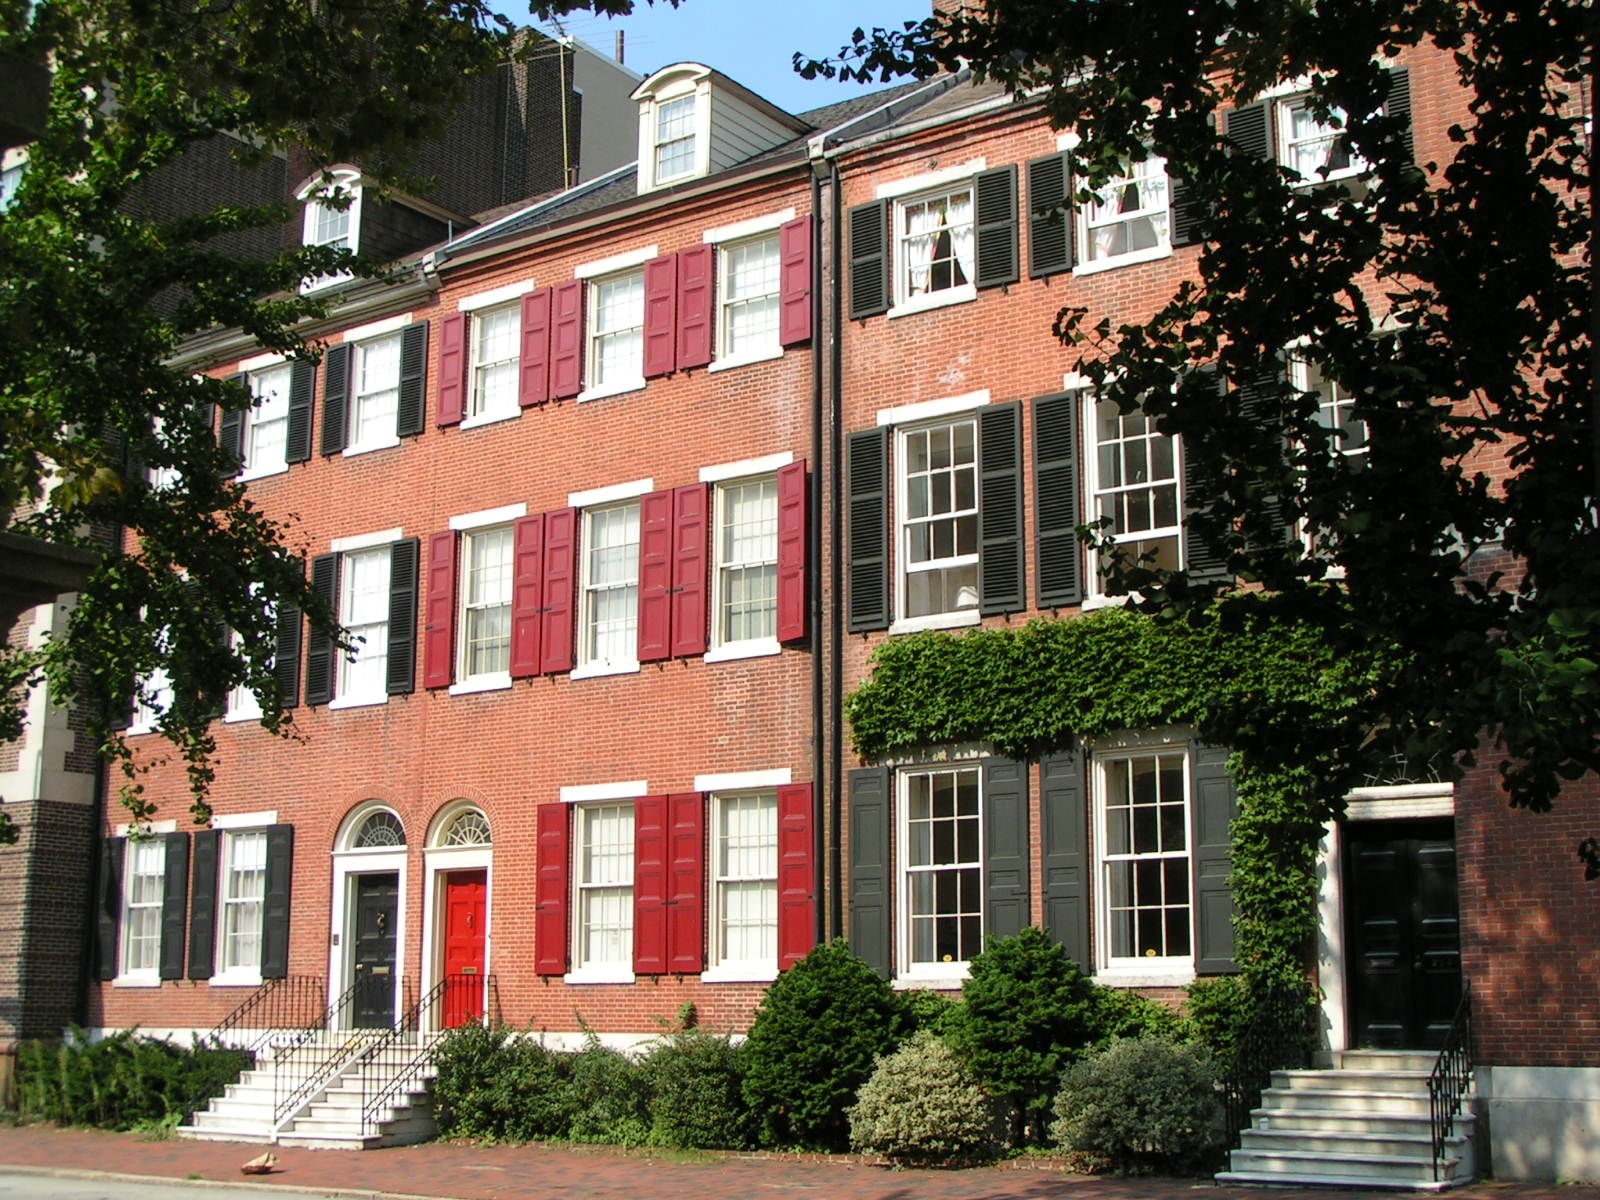 Philadelphia row homes, circa late 1700s